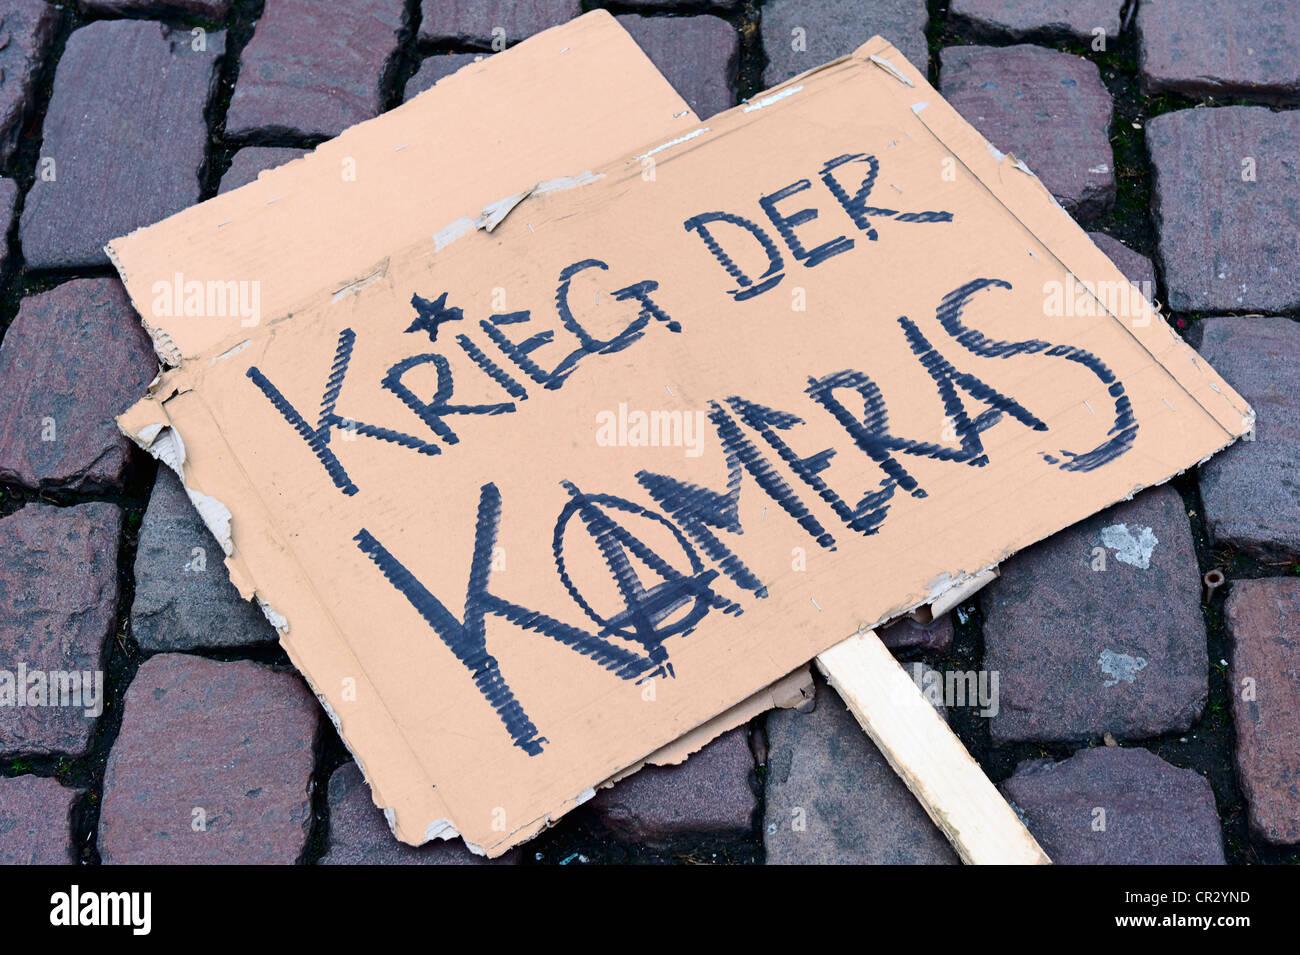 Sign, Krieg der Kameras, German for War of the cameras, protest against the use of surveillance video, demonstration - Stock Image